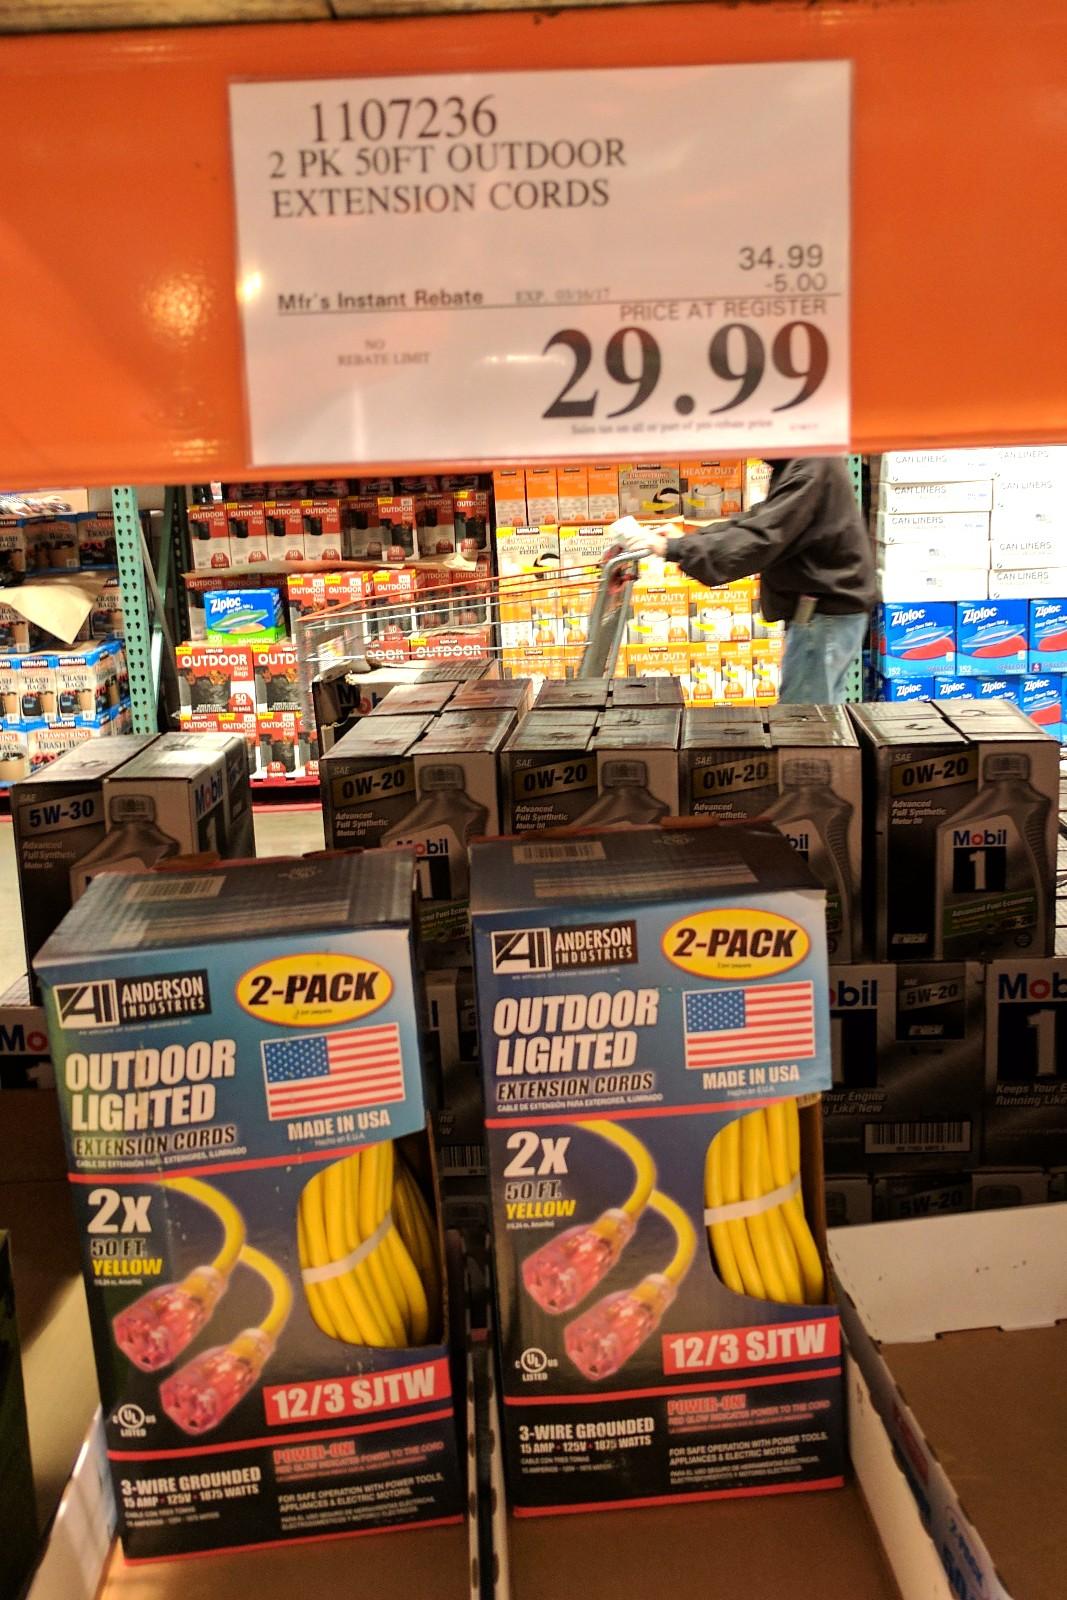 2 pack 50ft outdoor 12-gauge extension cord $29.99 - Costco